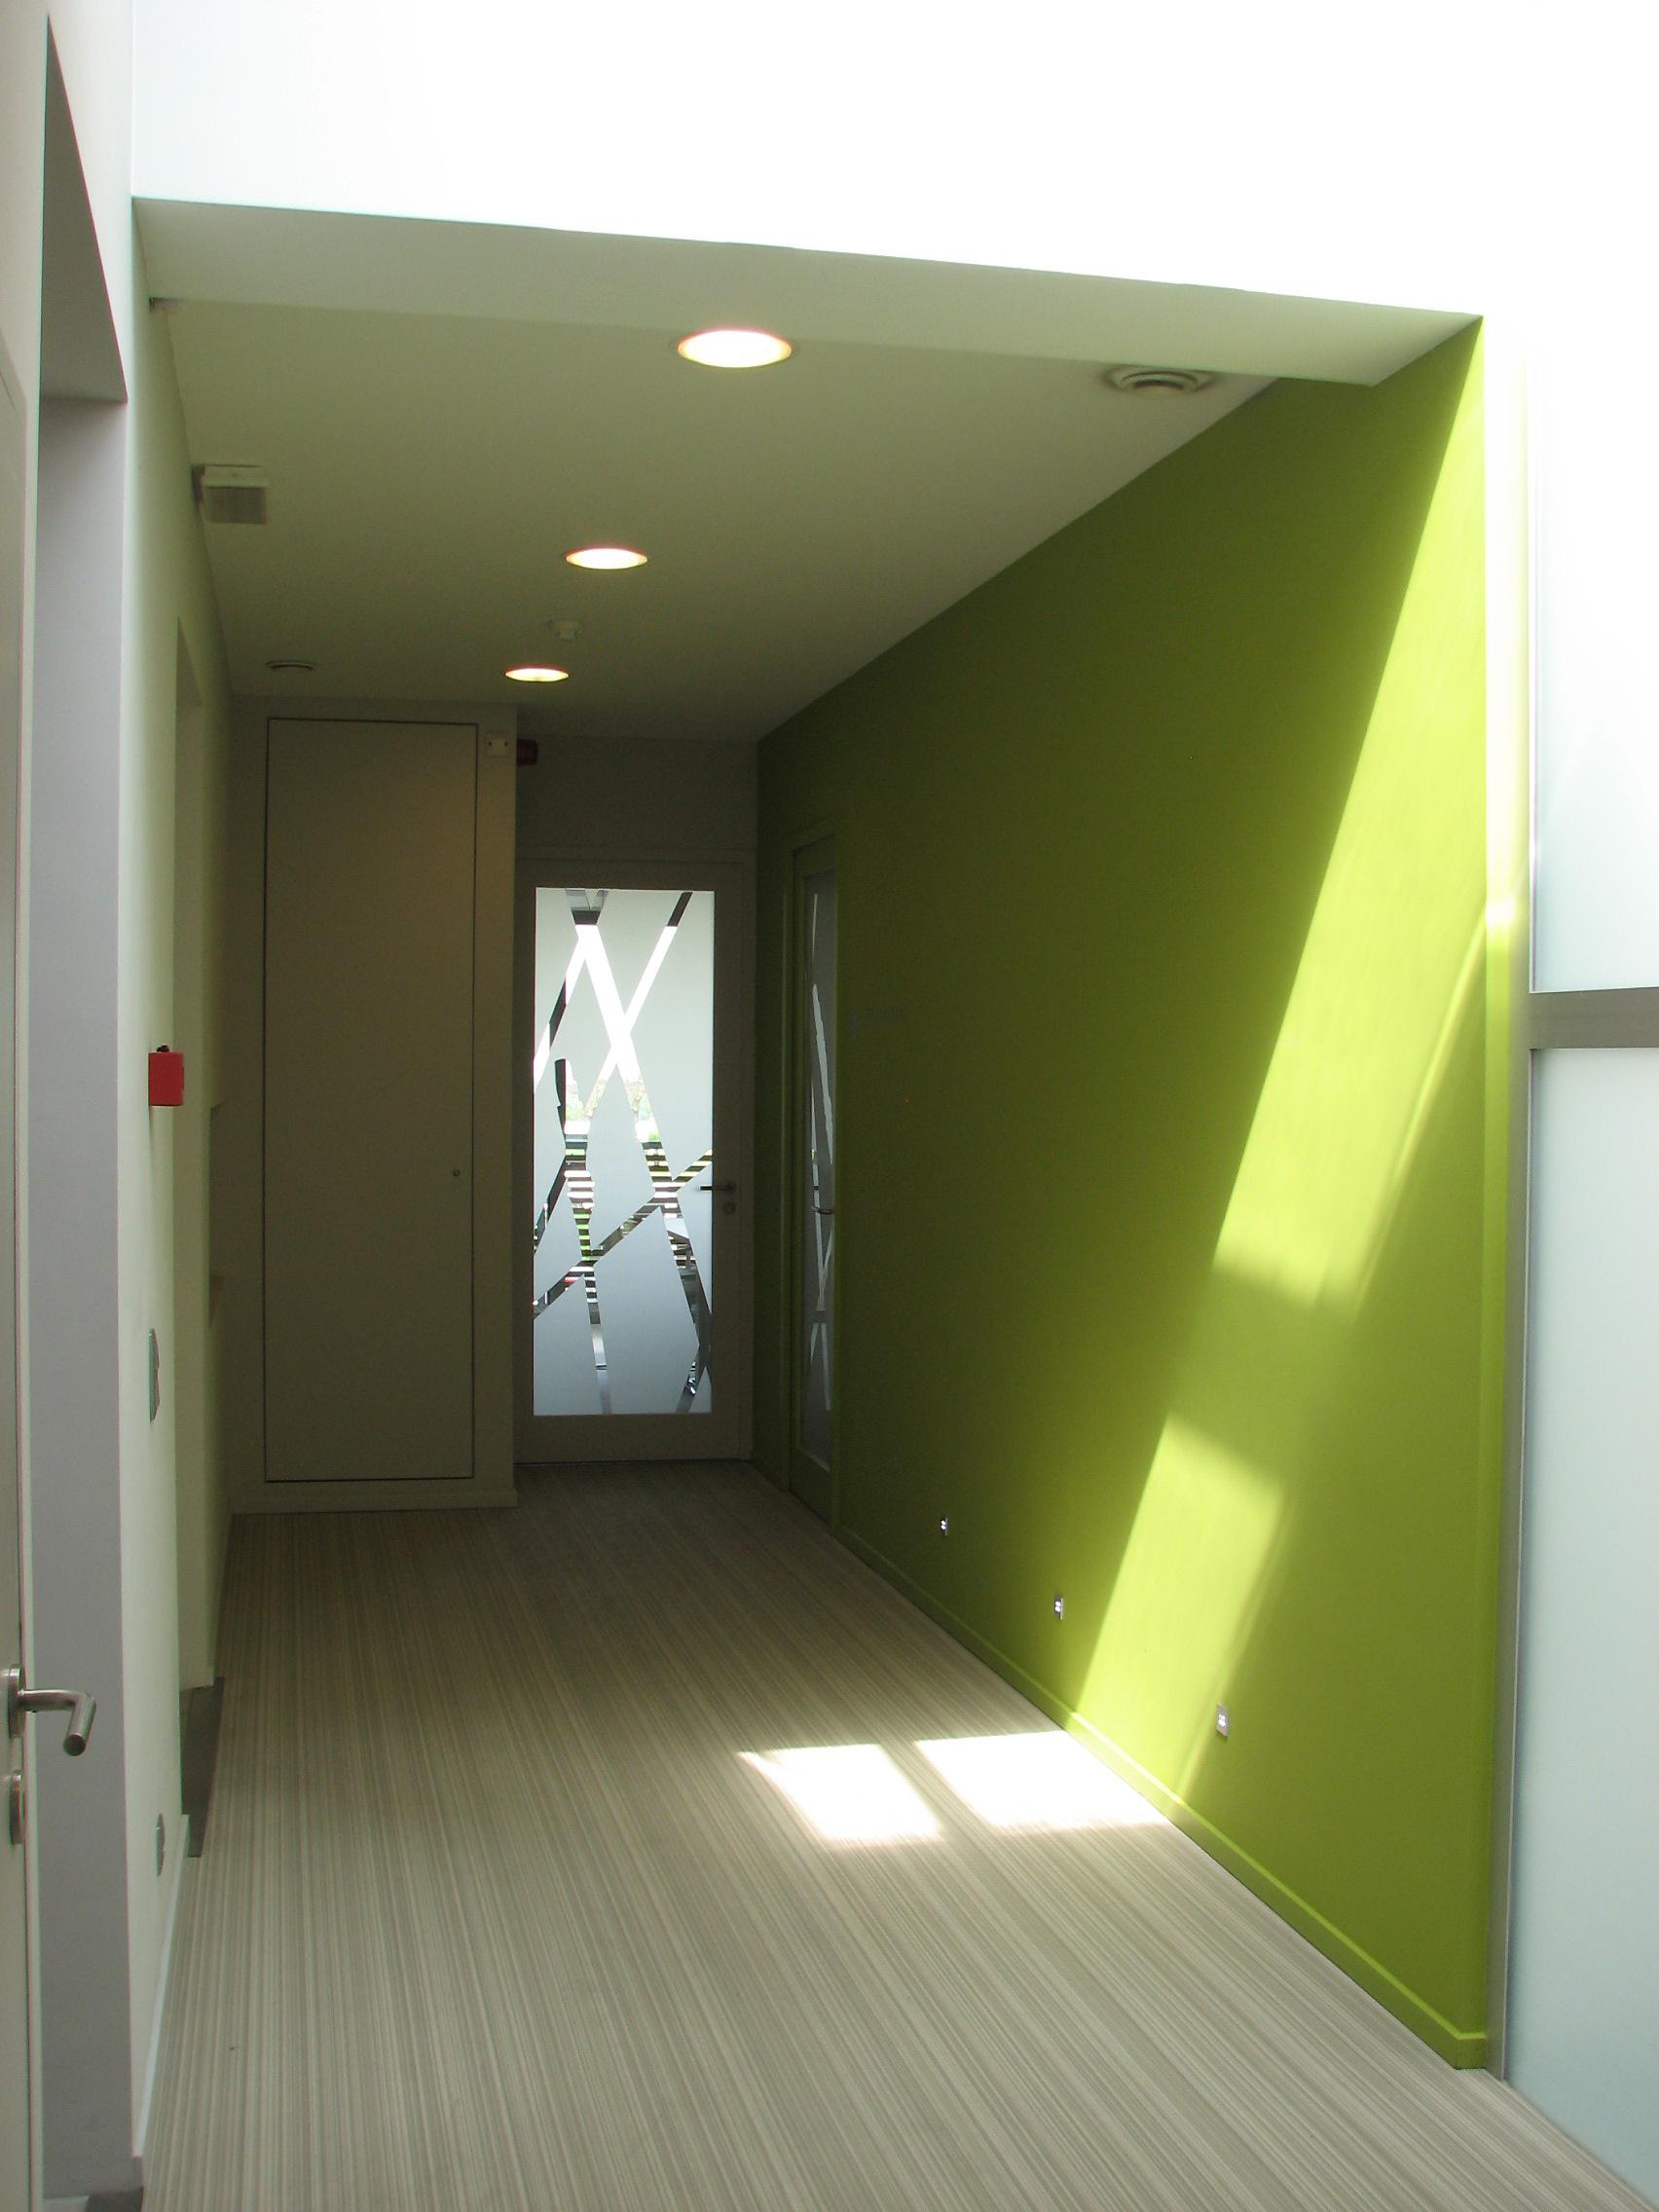 Tetrix - Julie Xhauflaire - Sipal Partners - #interior design #modern work space